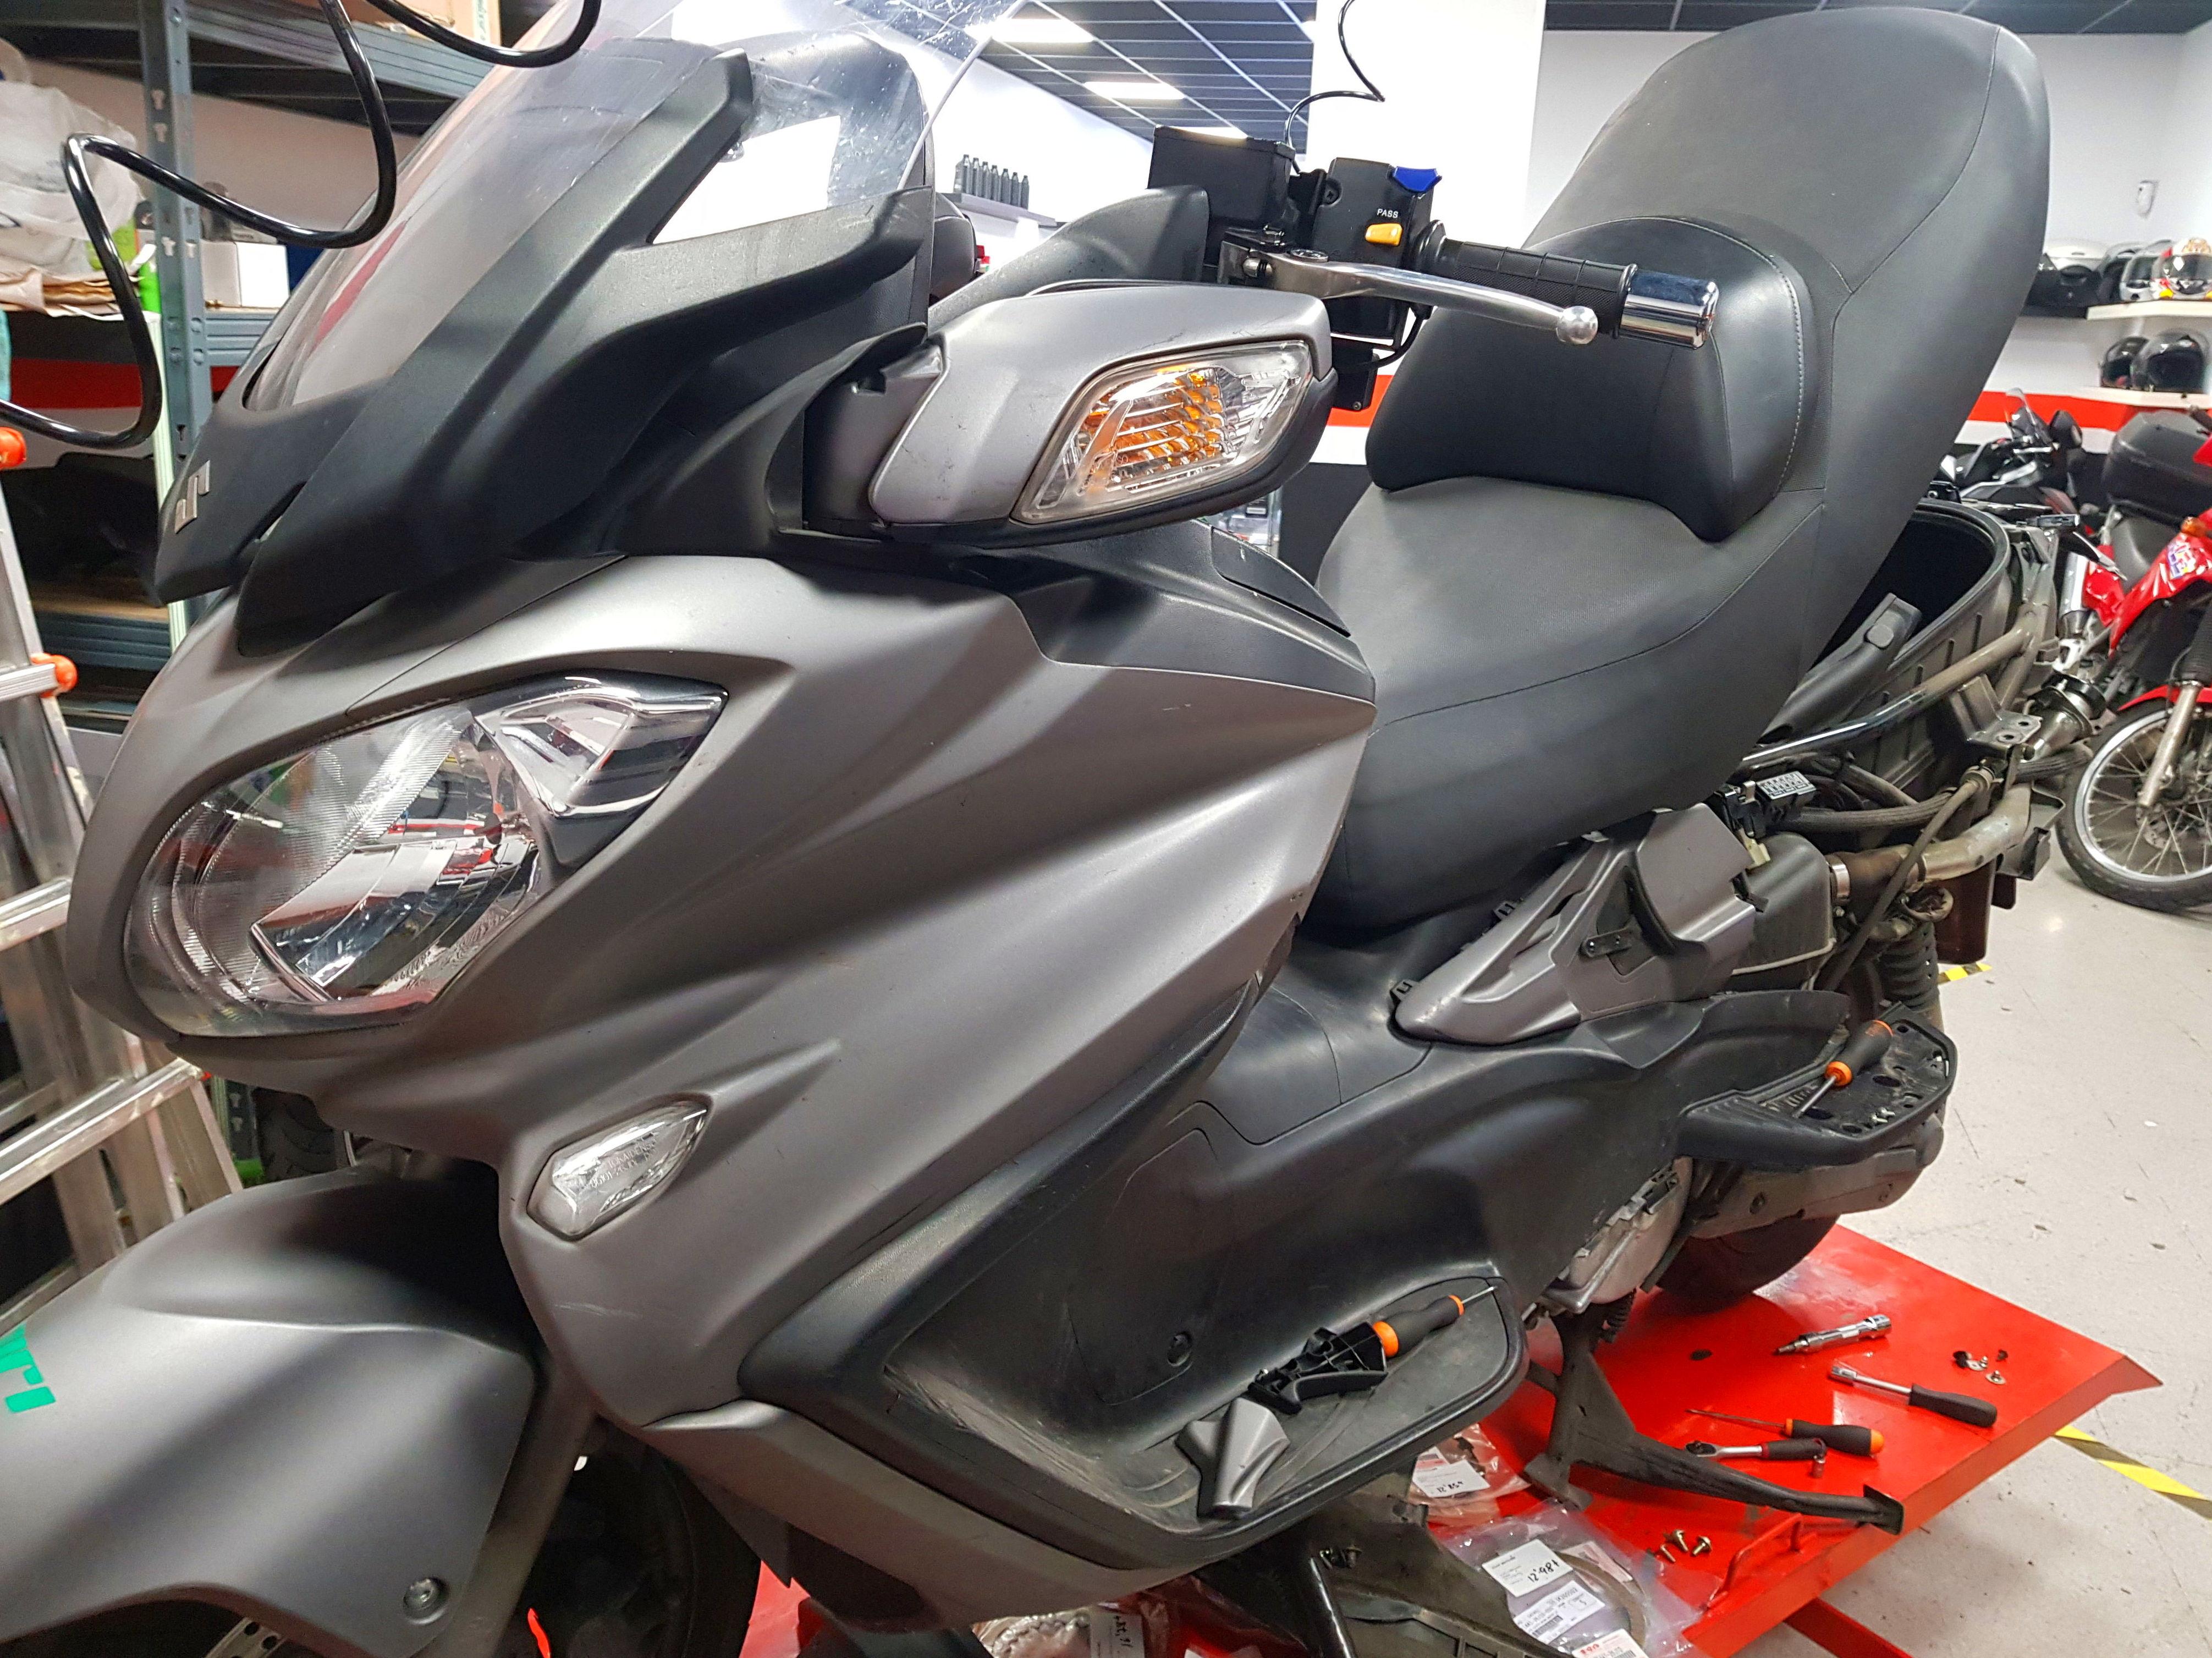 Foto 50 de Taller de motos multimarca en Mataró   Motos Iluro